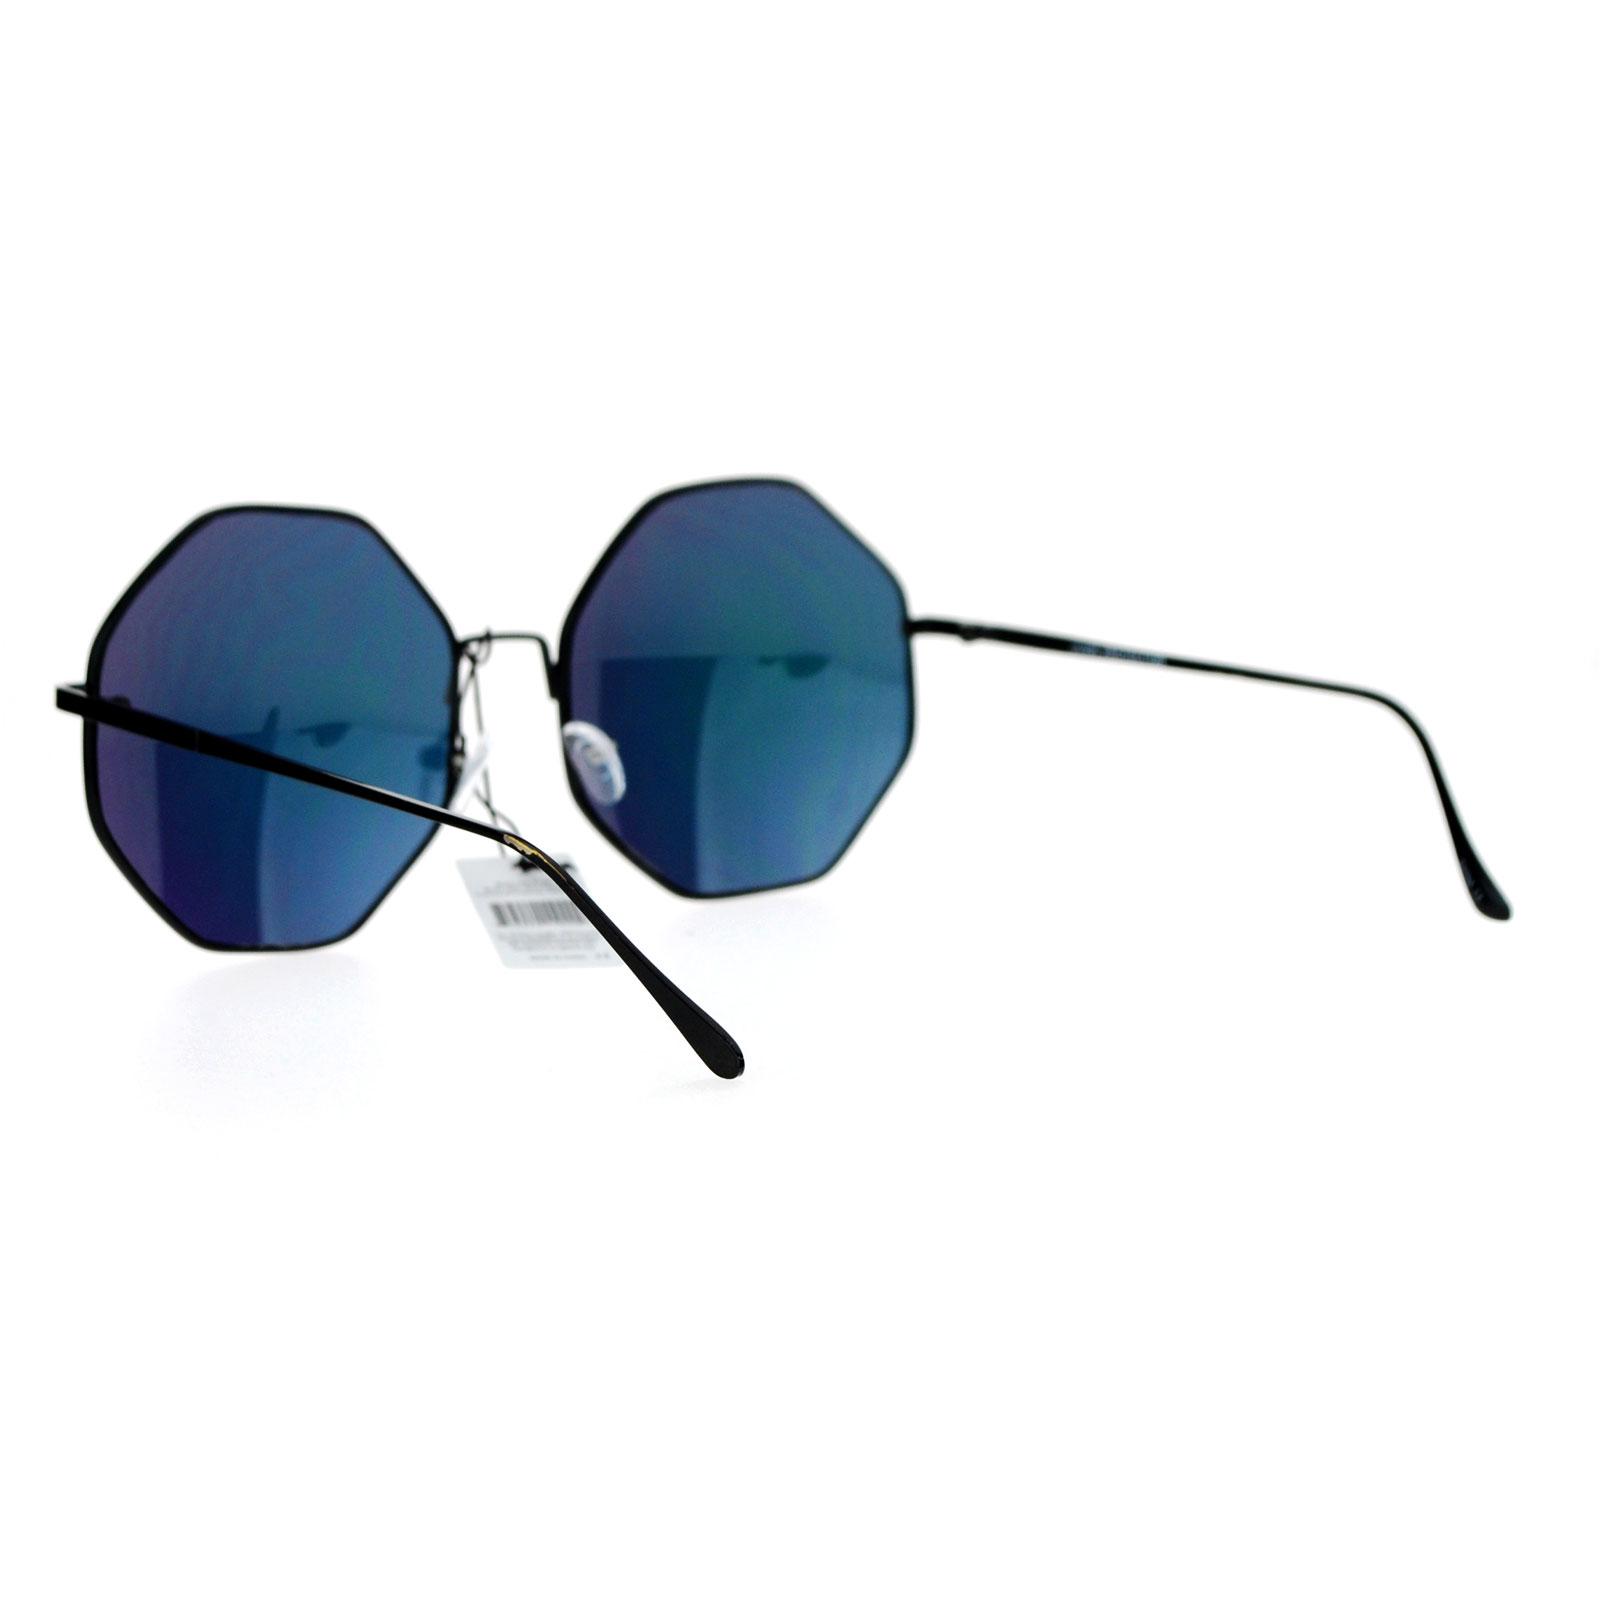 a9f8fca948c SA106 Pink Mirror Lens Octagon Metal Oversize Womens Sunglasses